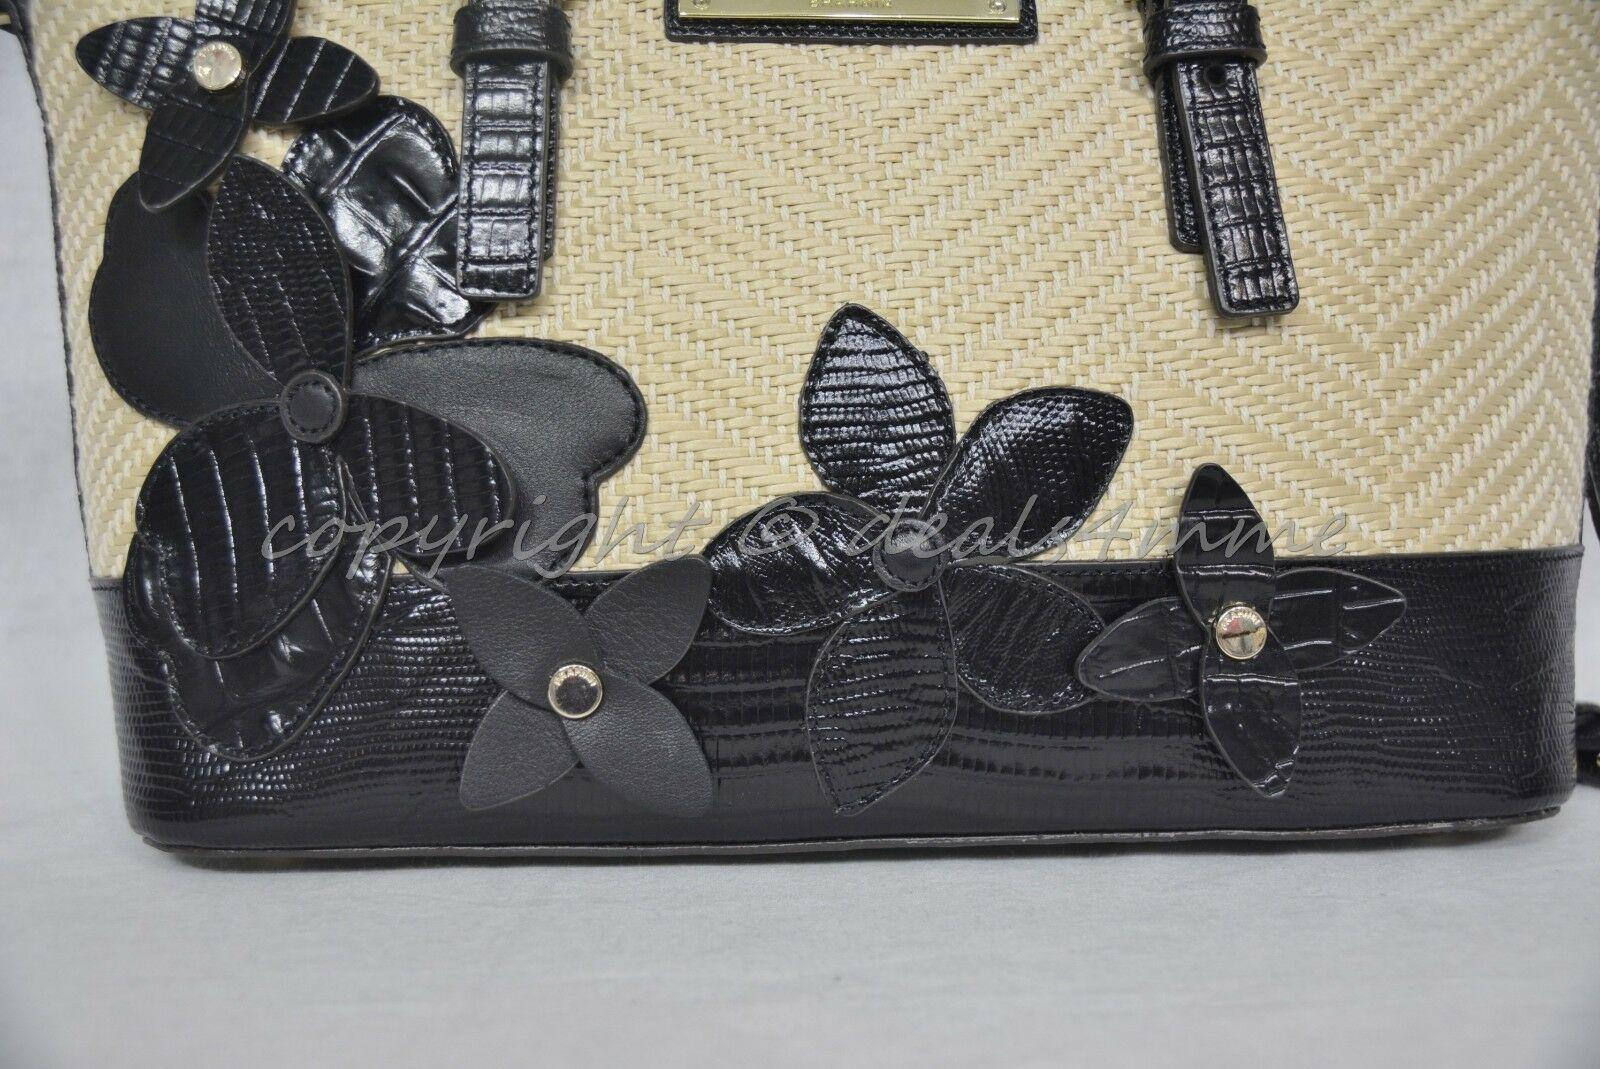 NWT Brahmin Mini Asher Satchel/Shoulder Bag in Black Miramonte-Cream with Black image 11